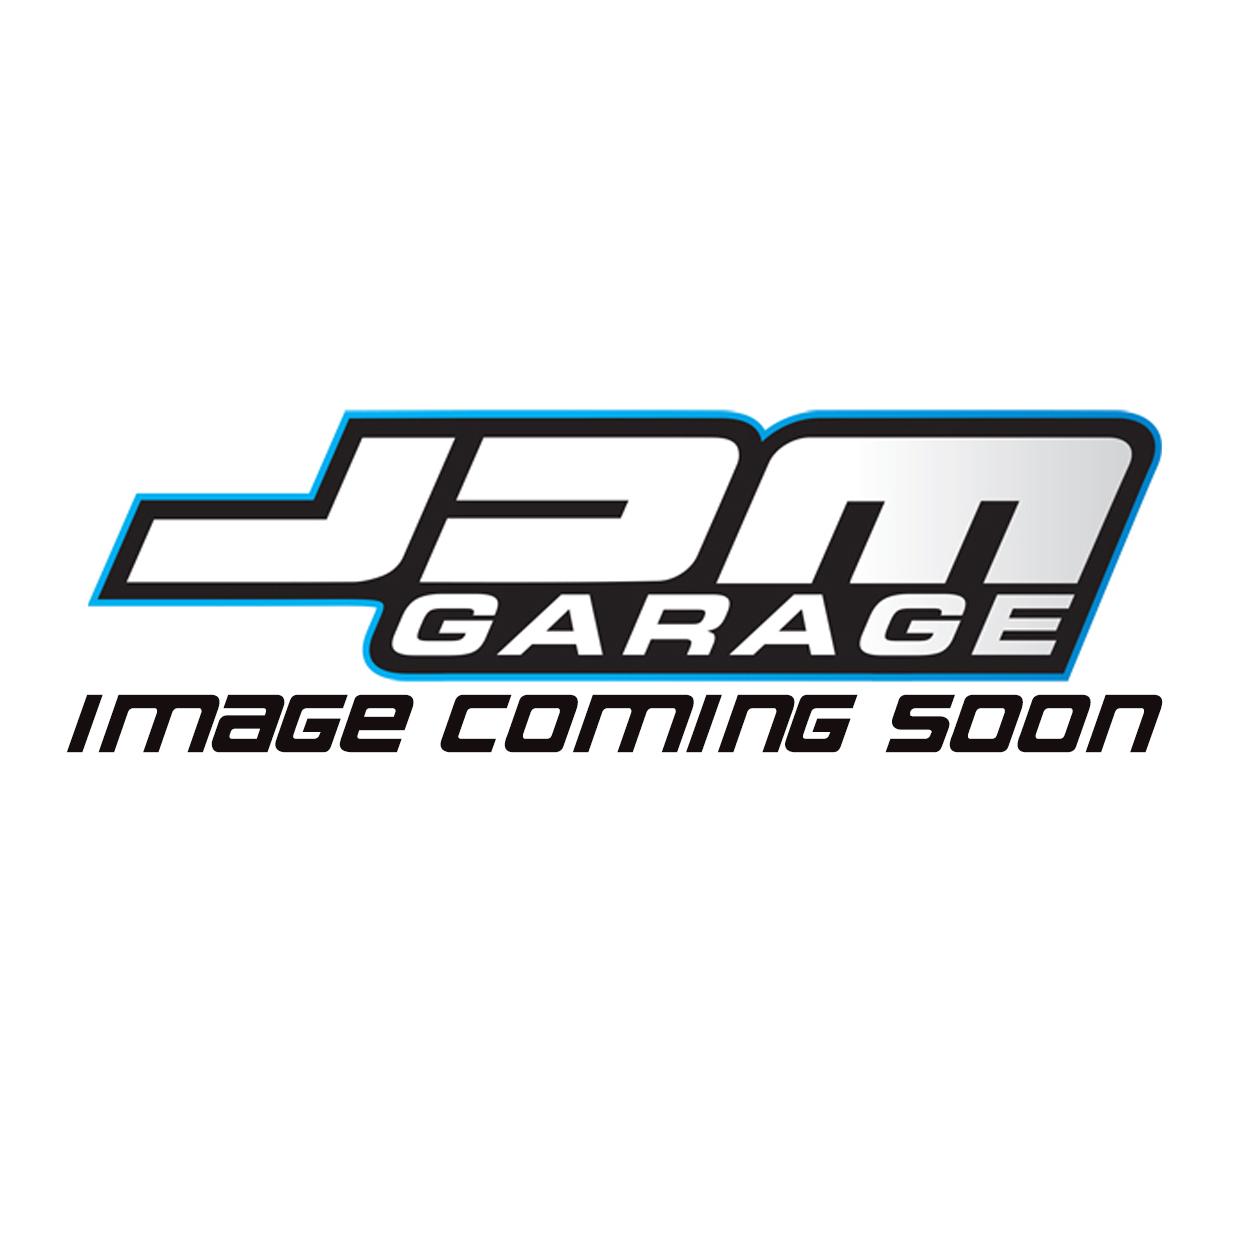 Real Street Performance Billet Main Cap Set 2JZ-GE / 2JZ-GTE / 1JZ-GTE